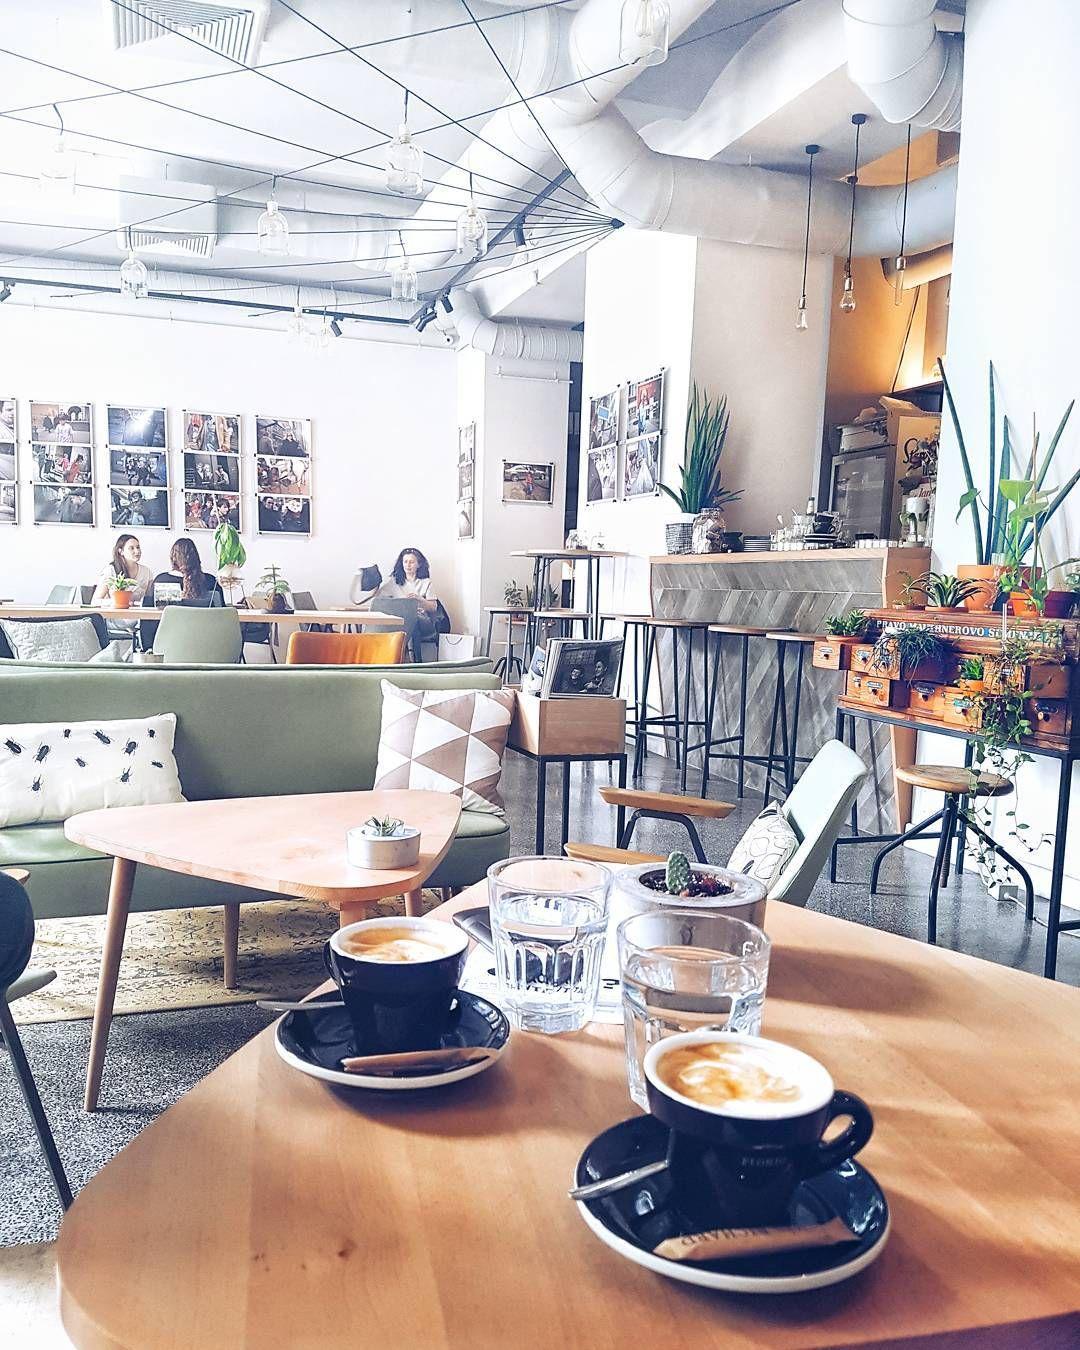 Iamgaura Instagram Bright Green Cafe Botanicar In Zagreb Interior Design Morning Coffee Green Interior Green Interiors Green Cafe Interior Design